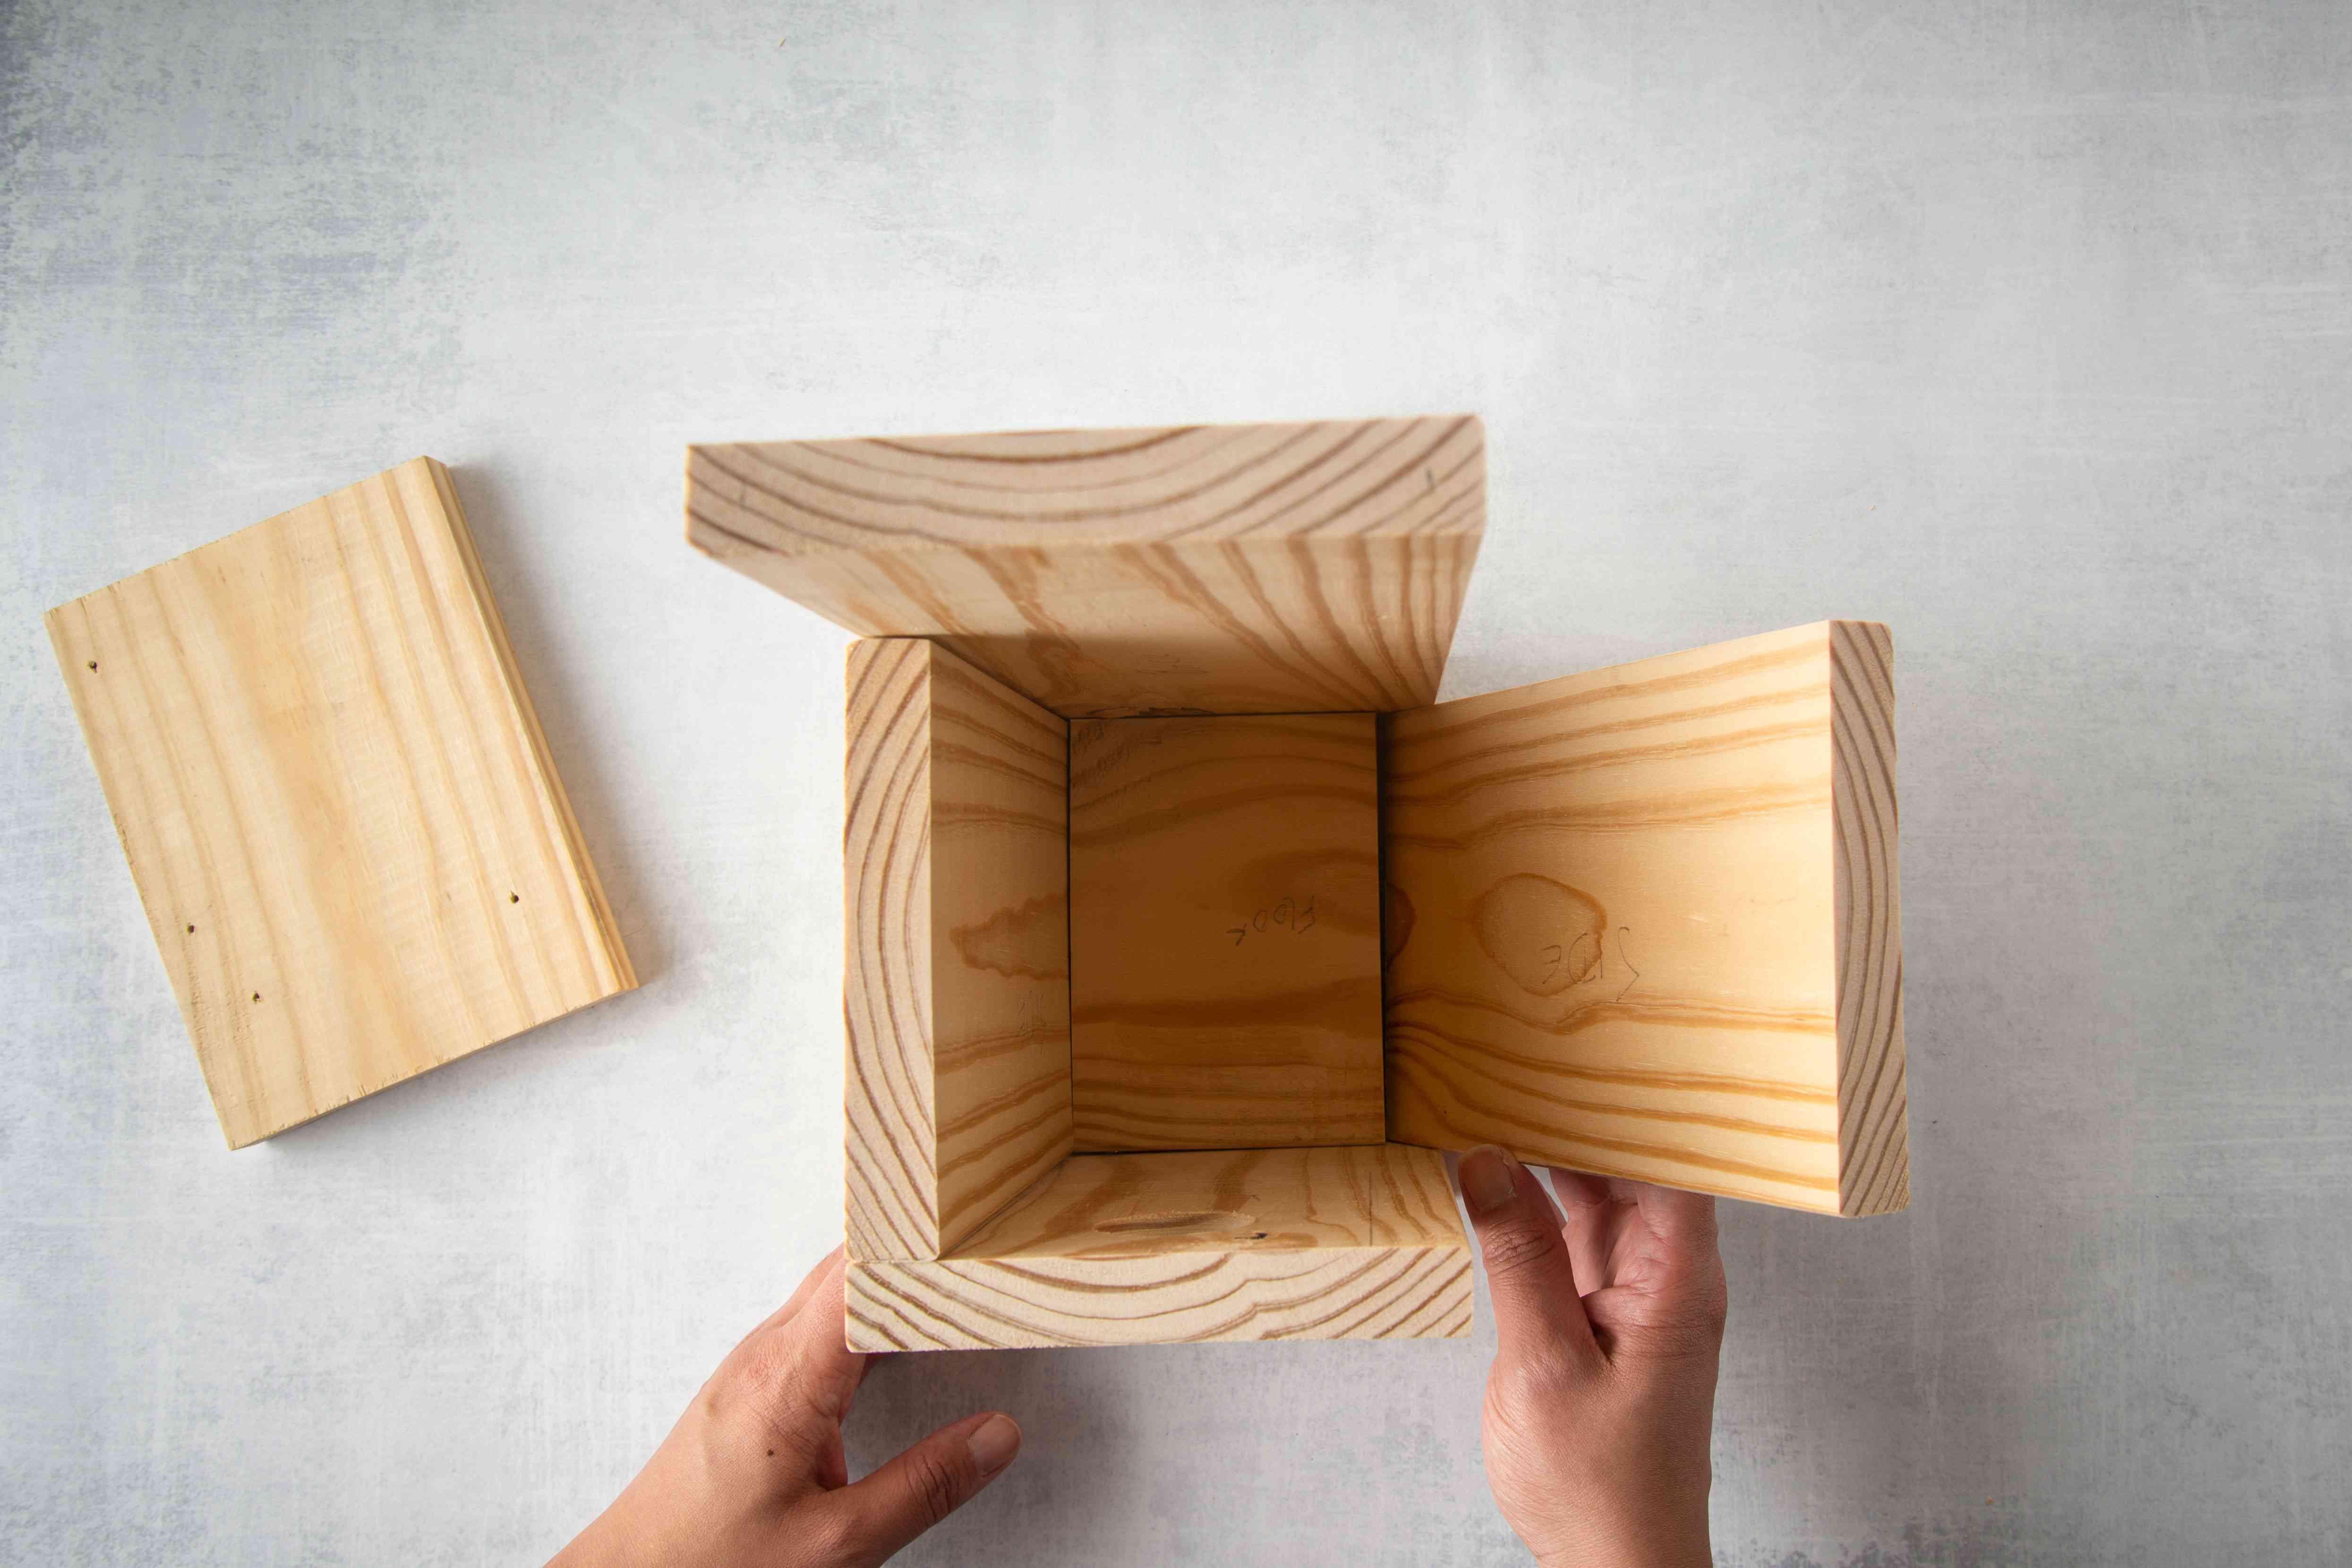 A birdhouse frame.